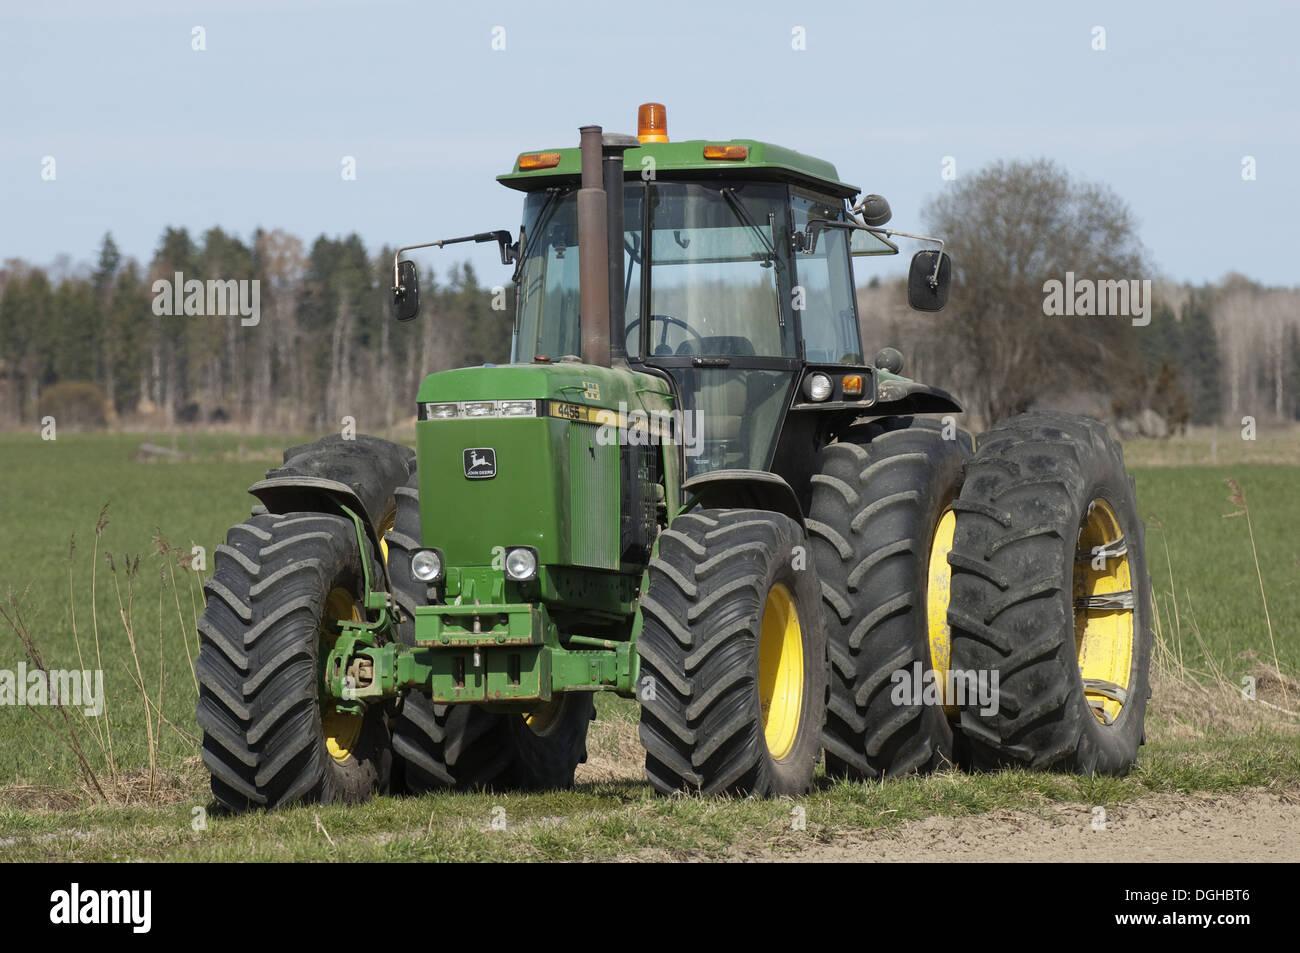 John Deere Dual Wheels : John deere tractor with dual wheels sweden may